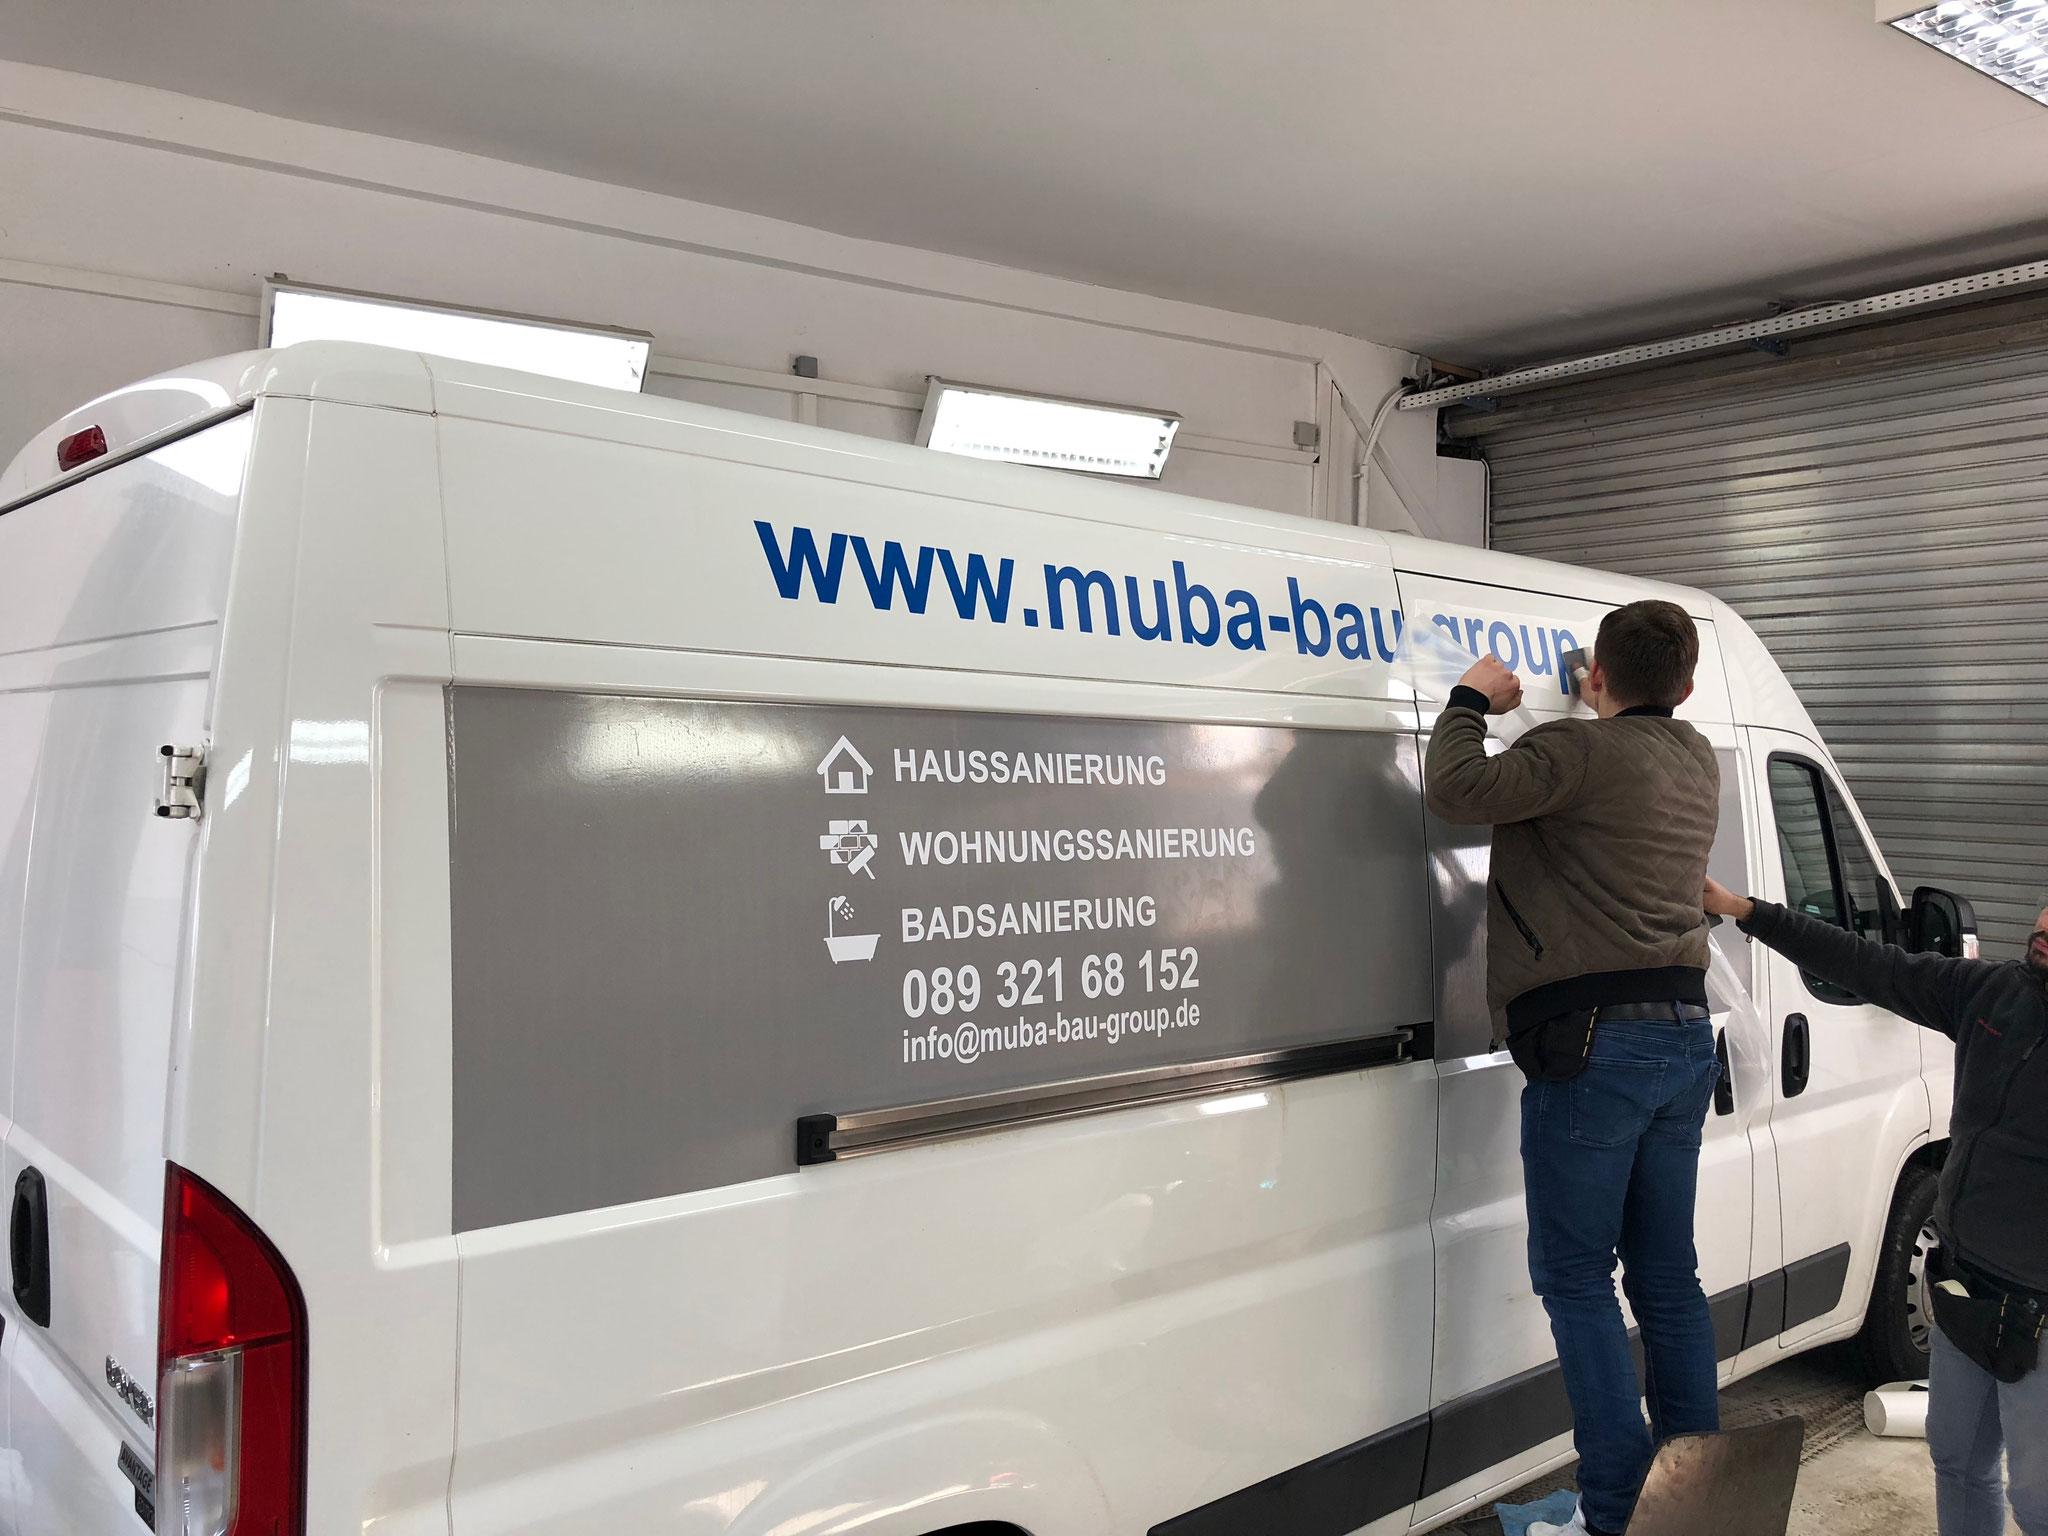 Muba Bau Gmbh Autobeschriftung in München